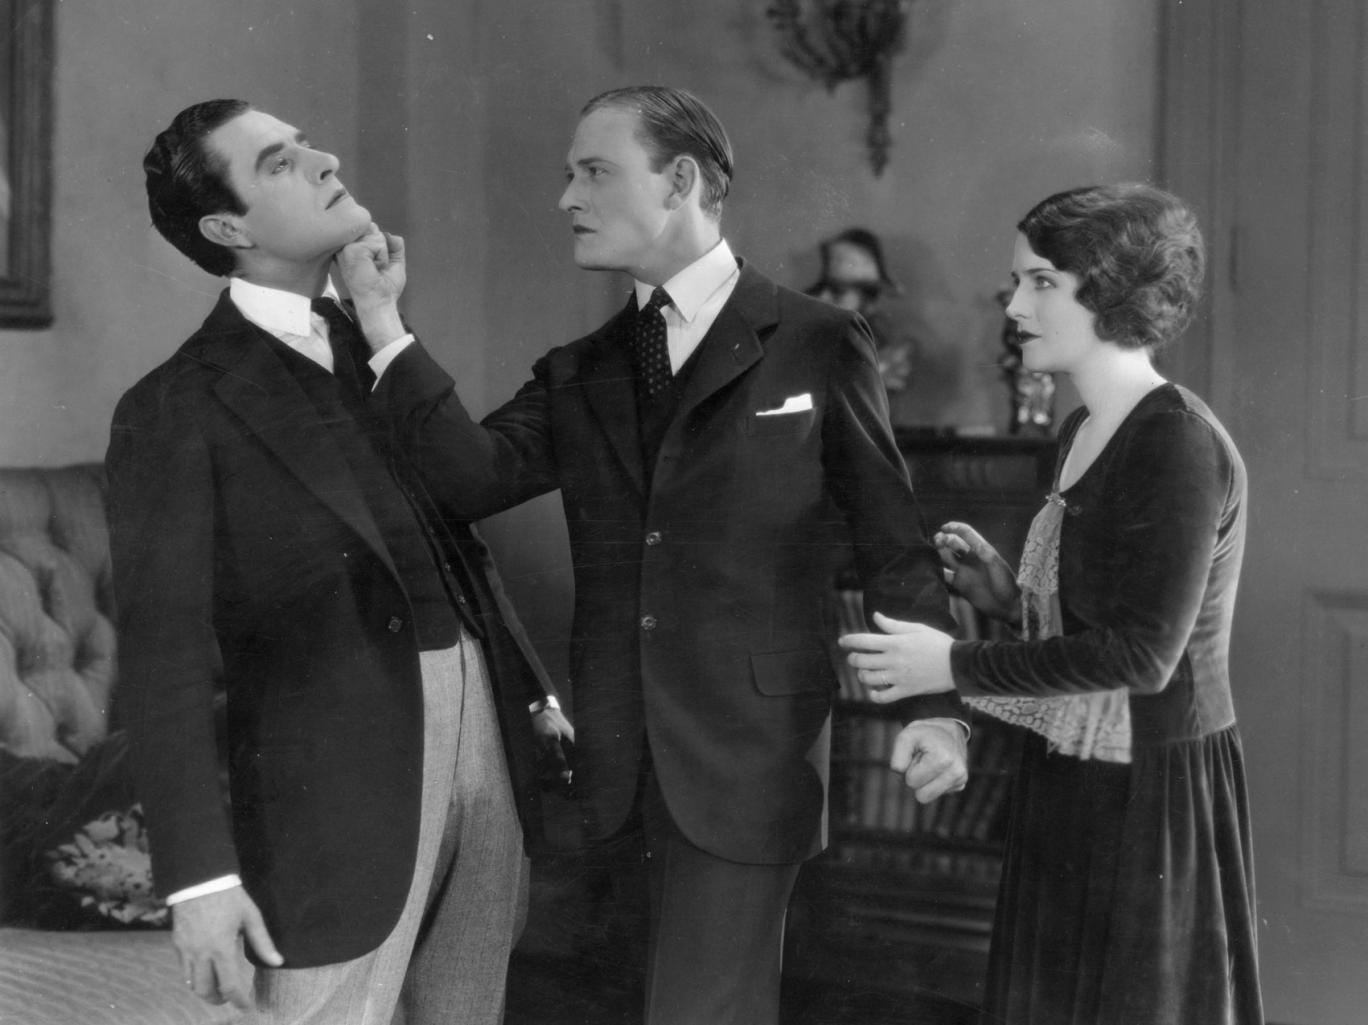 Norma Shearer, The Snob, polite fight, restrain, hold back